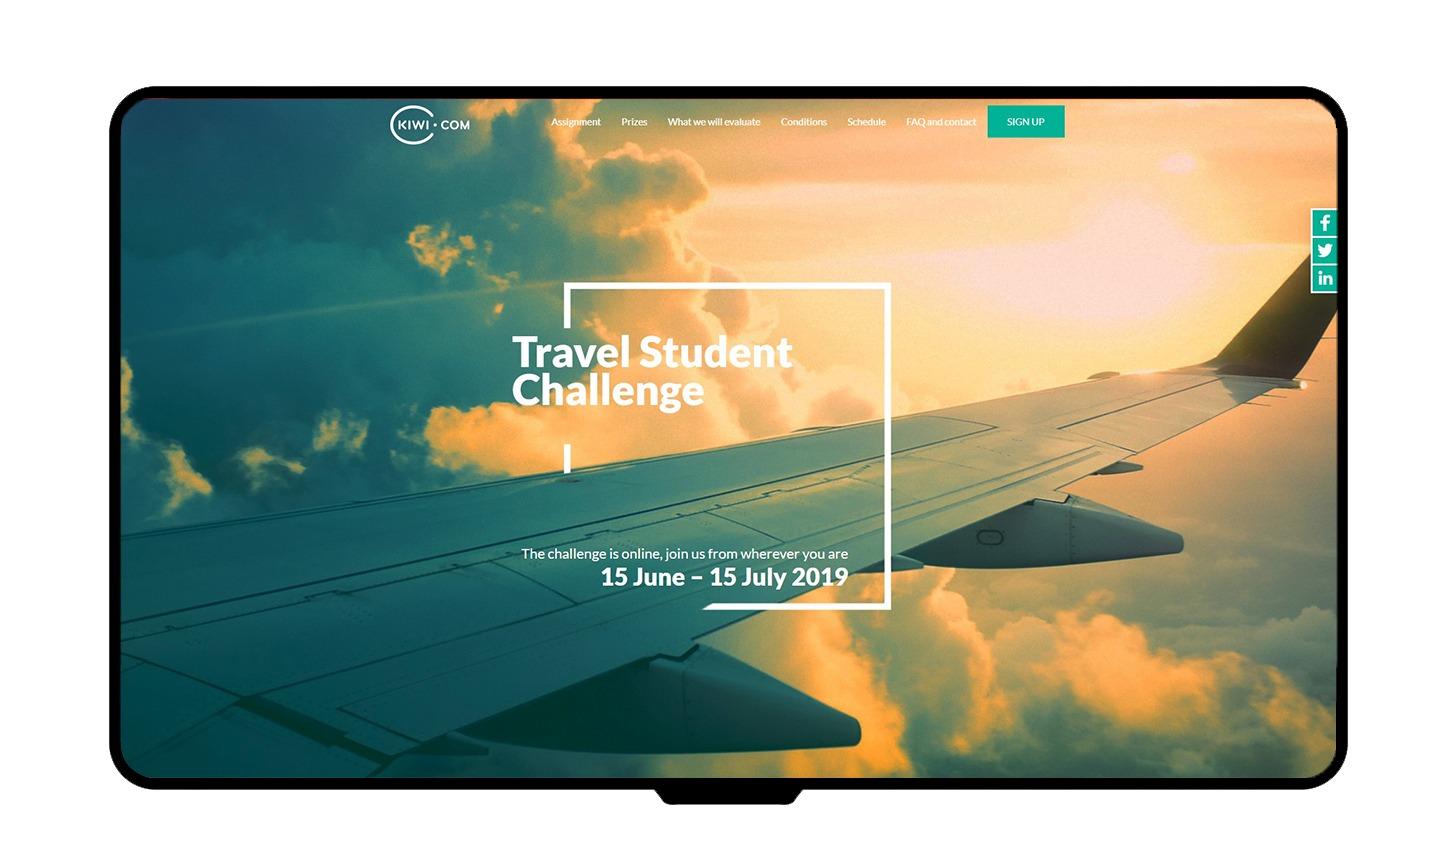 Kiwi.com - Student challenge mockup